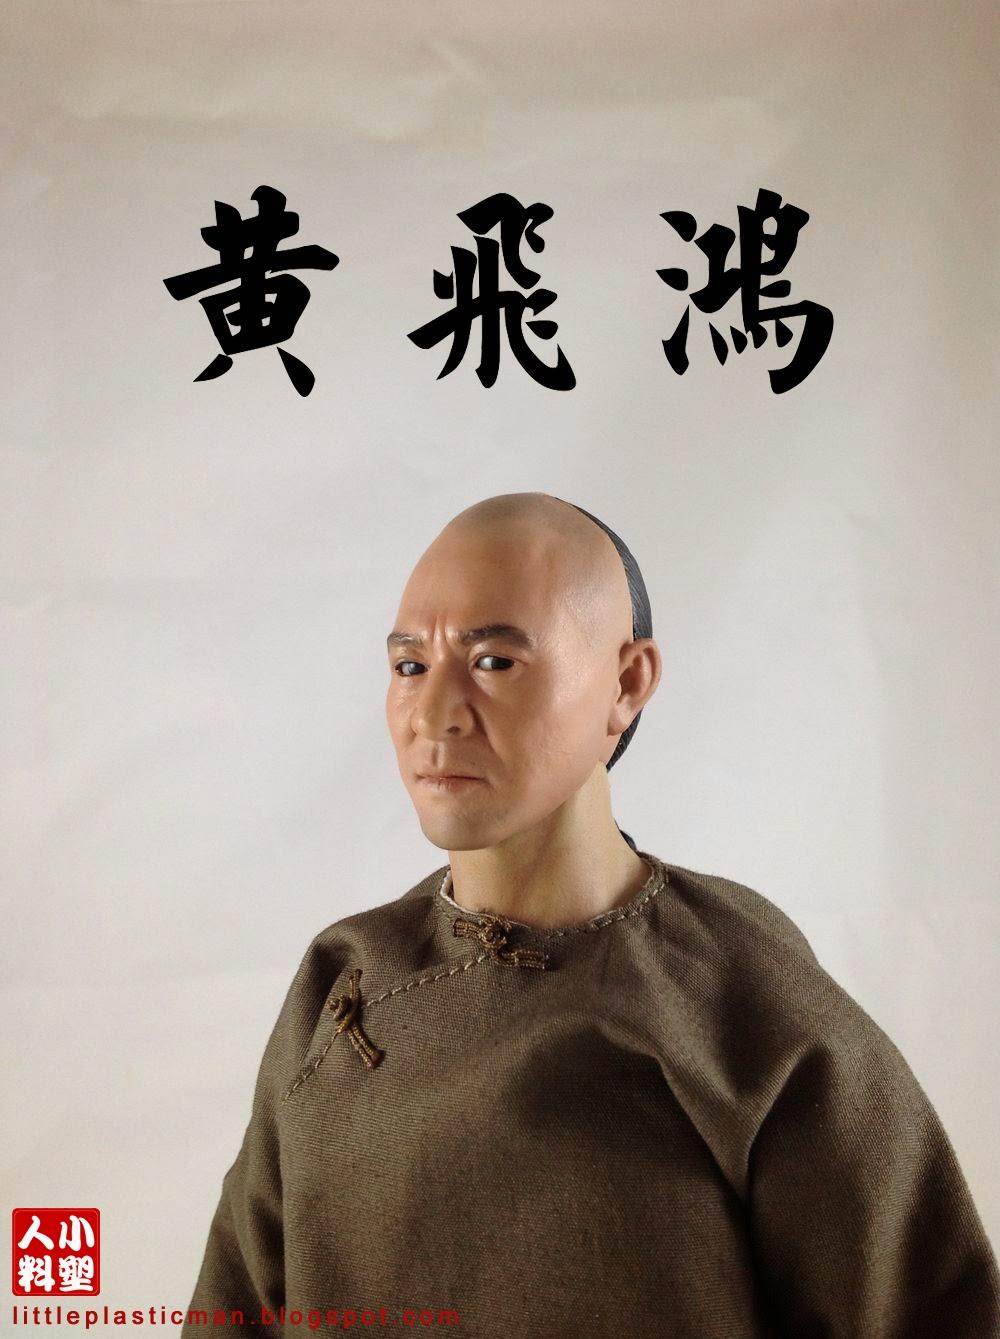 King Of Kung Fu: My Favorite Wong Fei Hung Movies